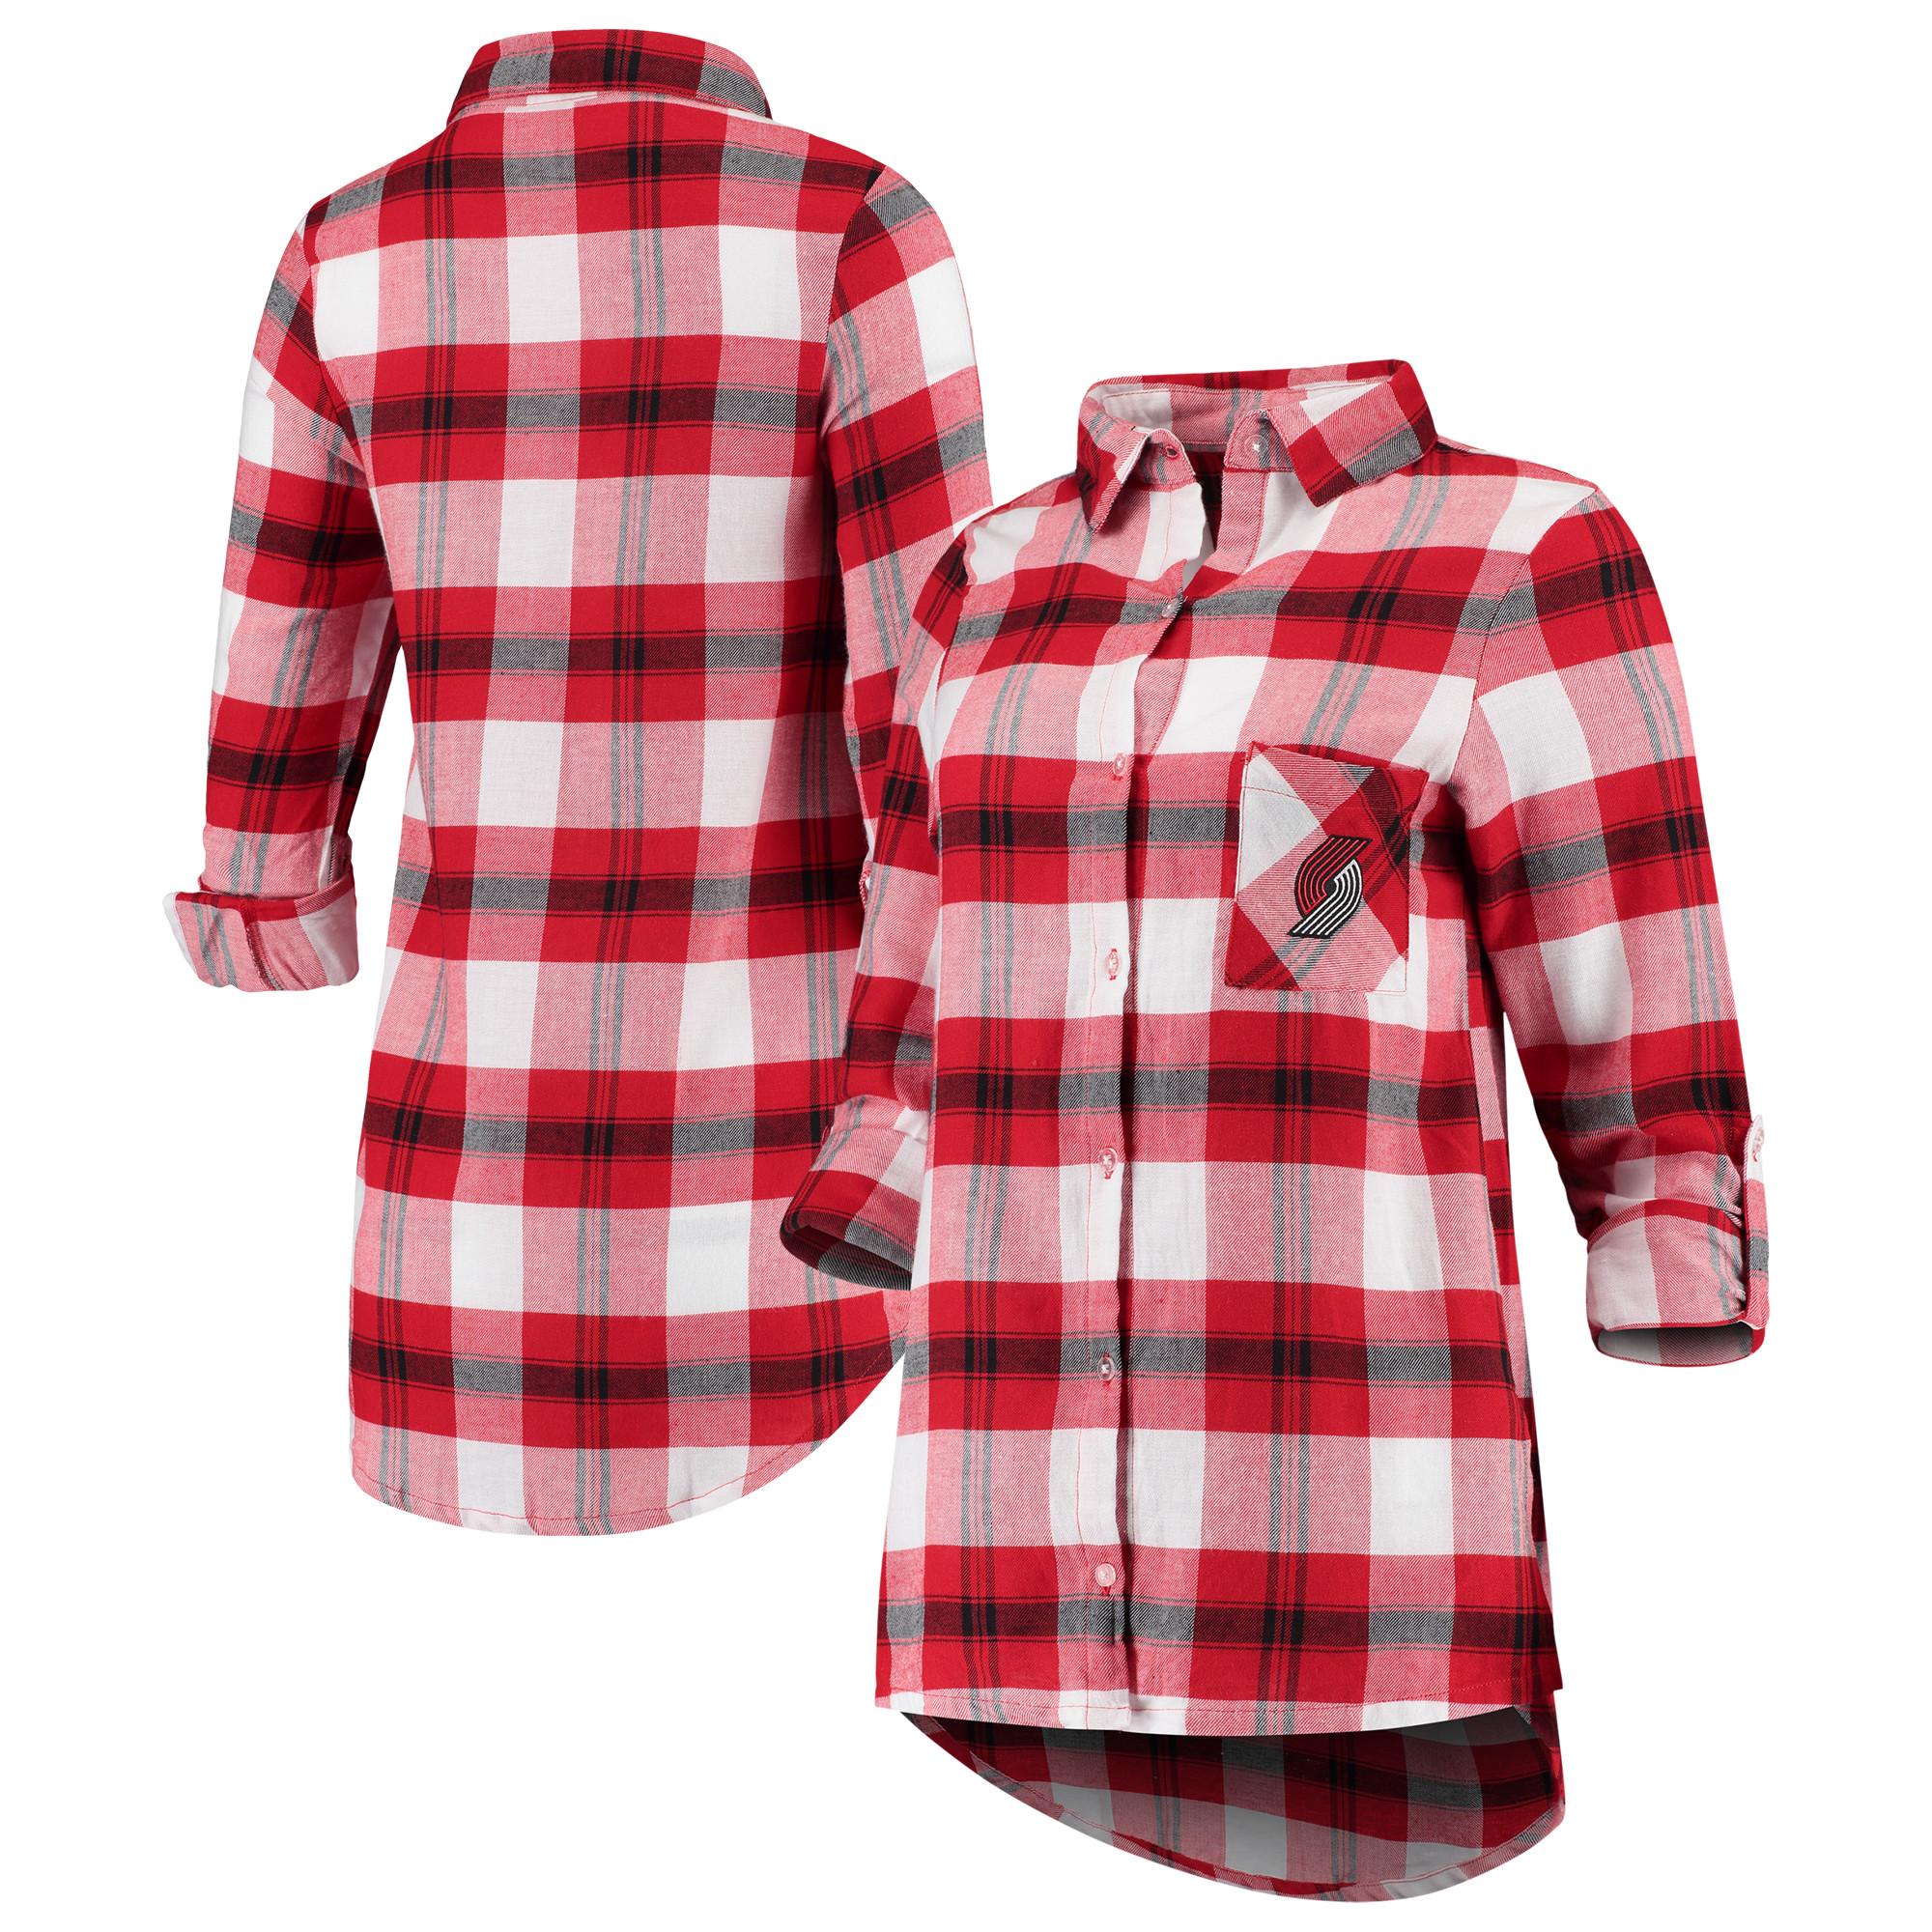 Portland Trail Blazers Concepts Sport Women's Headway Long Sleeve Plaid Tunic - Red/Black